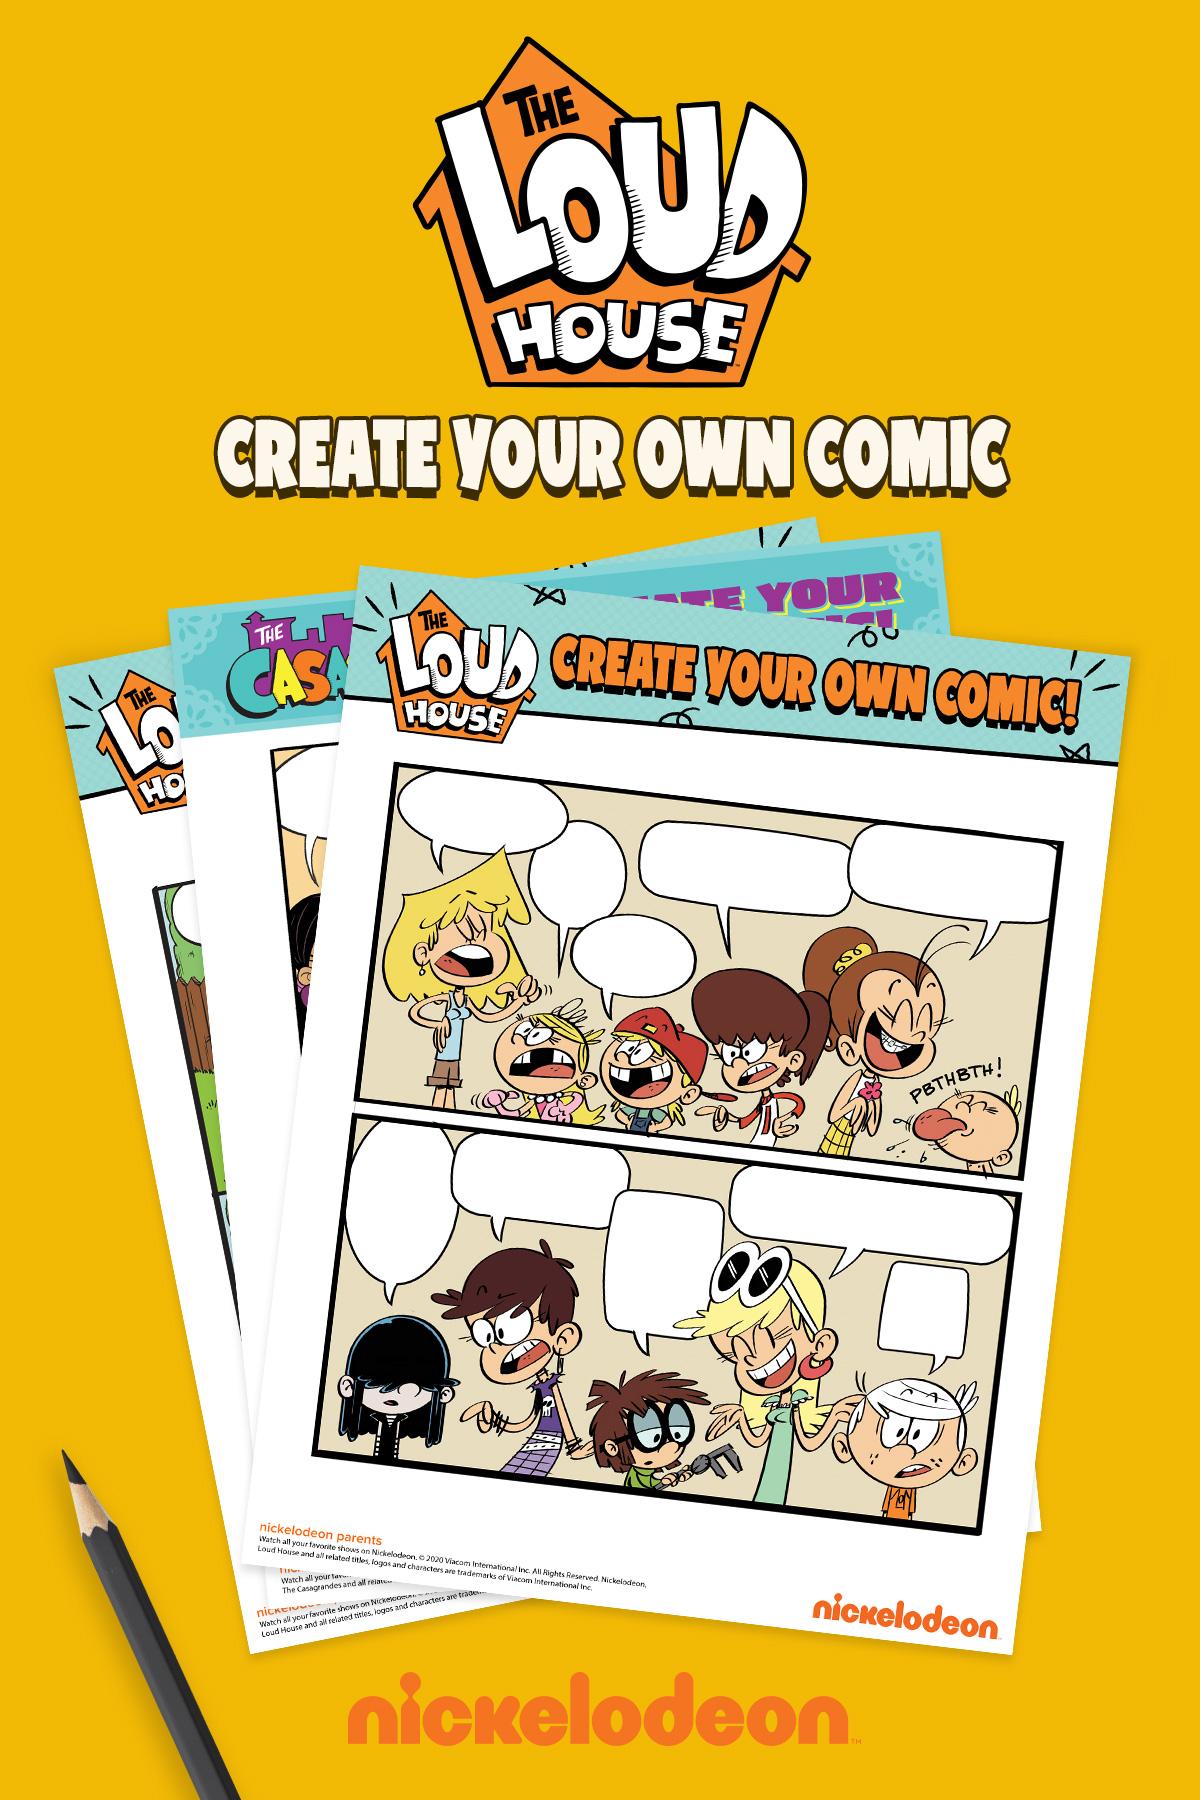 LoudHouse Comics- create your own comic!